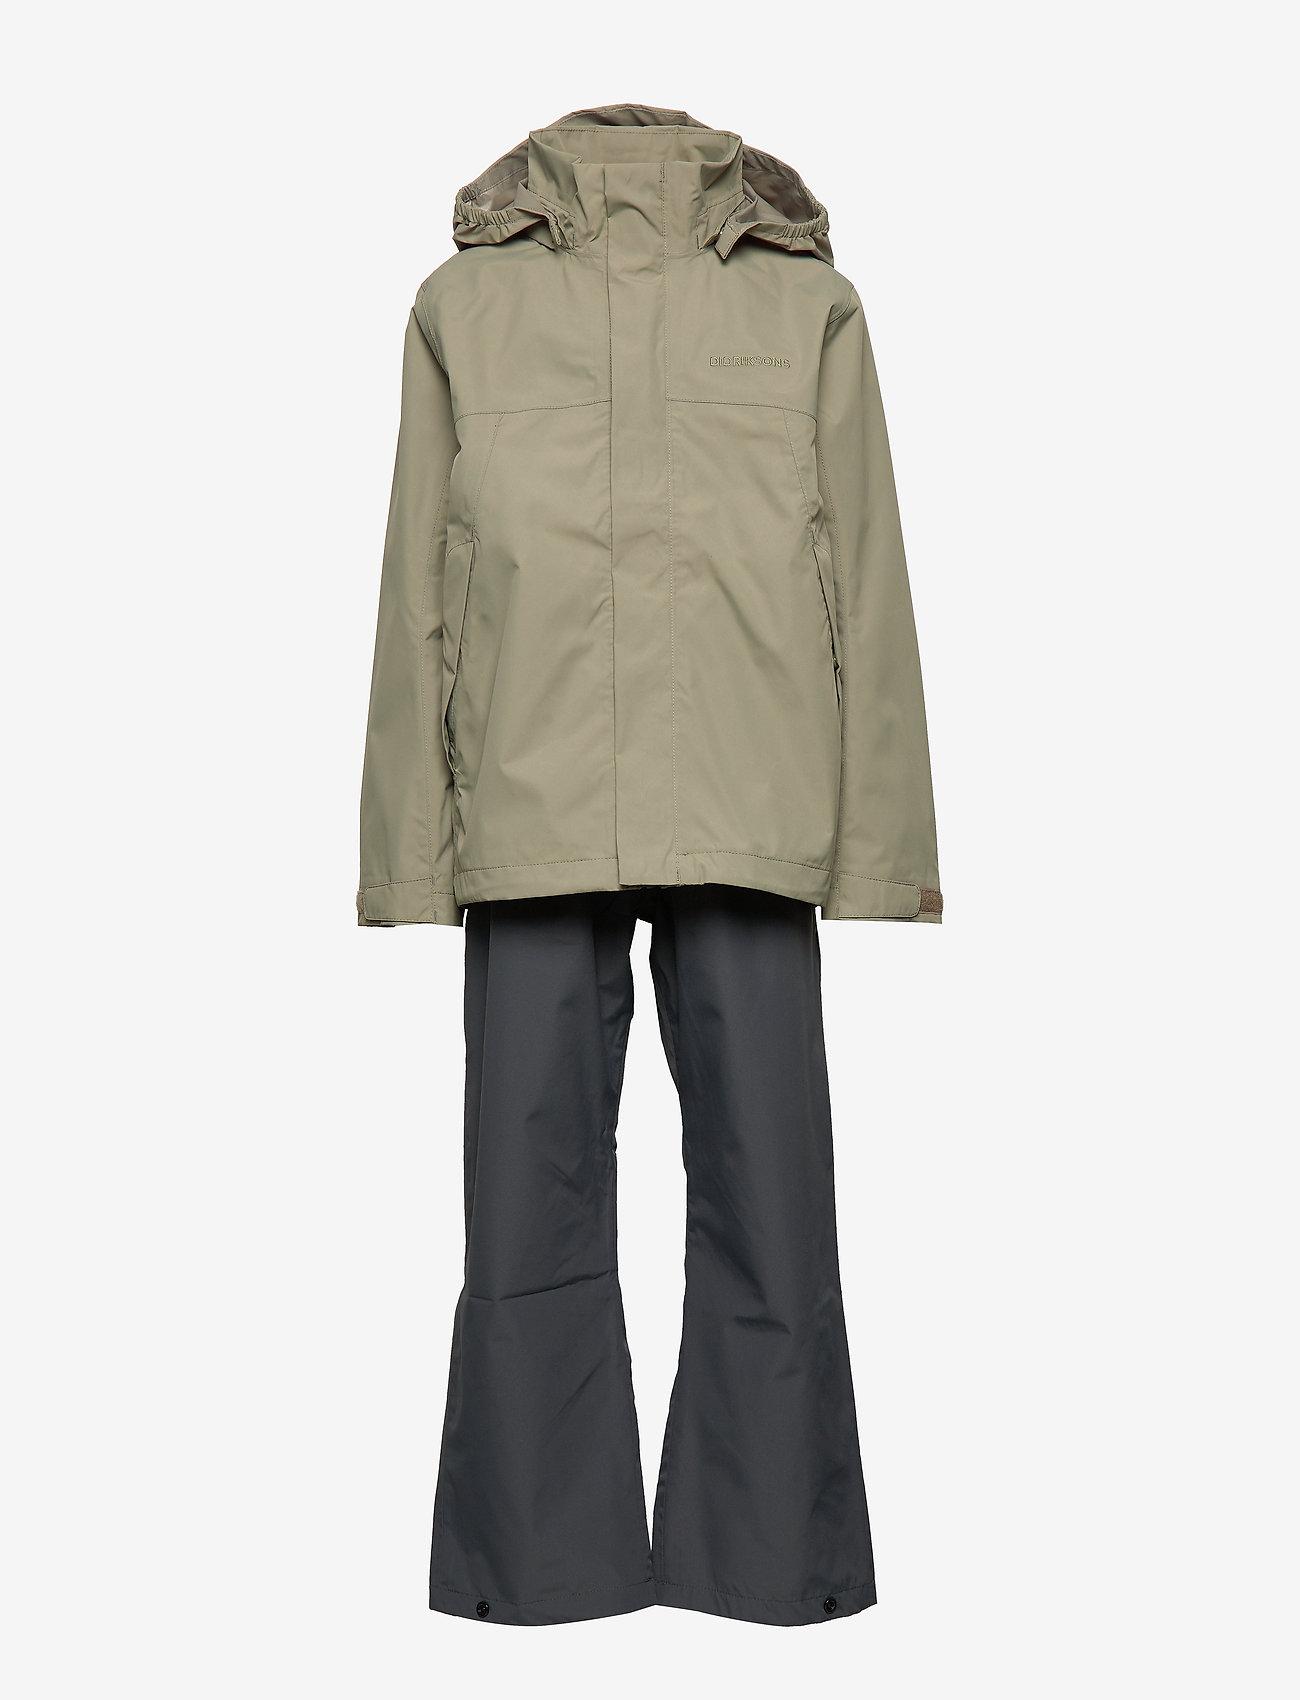 Didriksons - GRAND YT RAIN SET - sets & suits - mistel green - 1